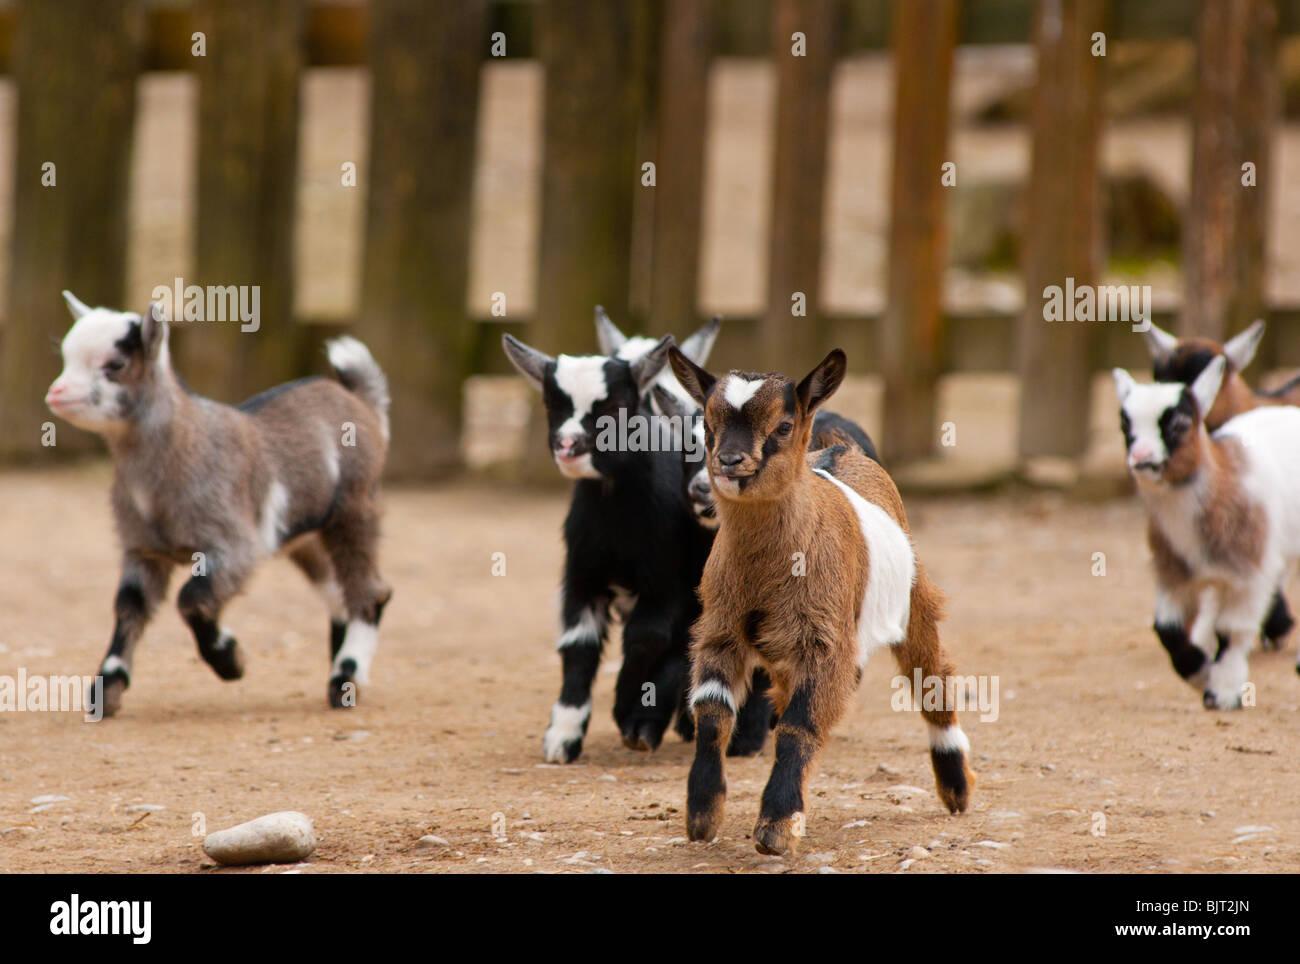 Cute Baby Ziegen laufen Stockbild